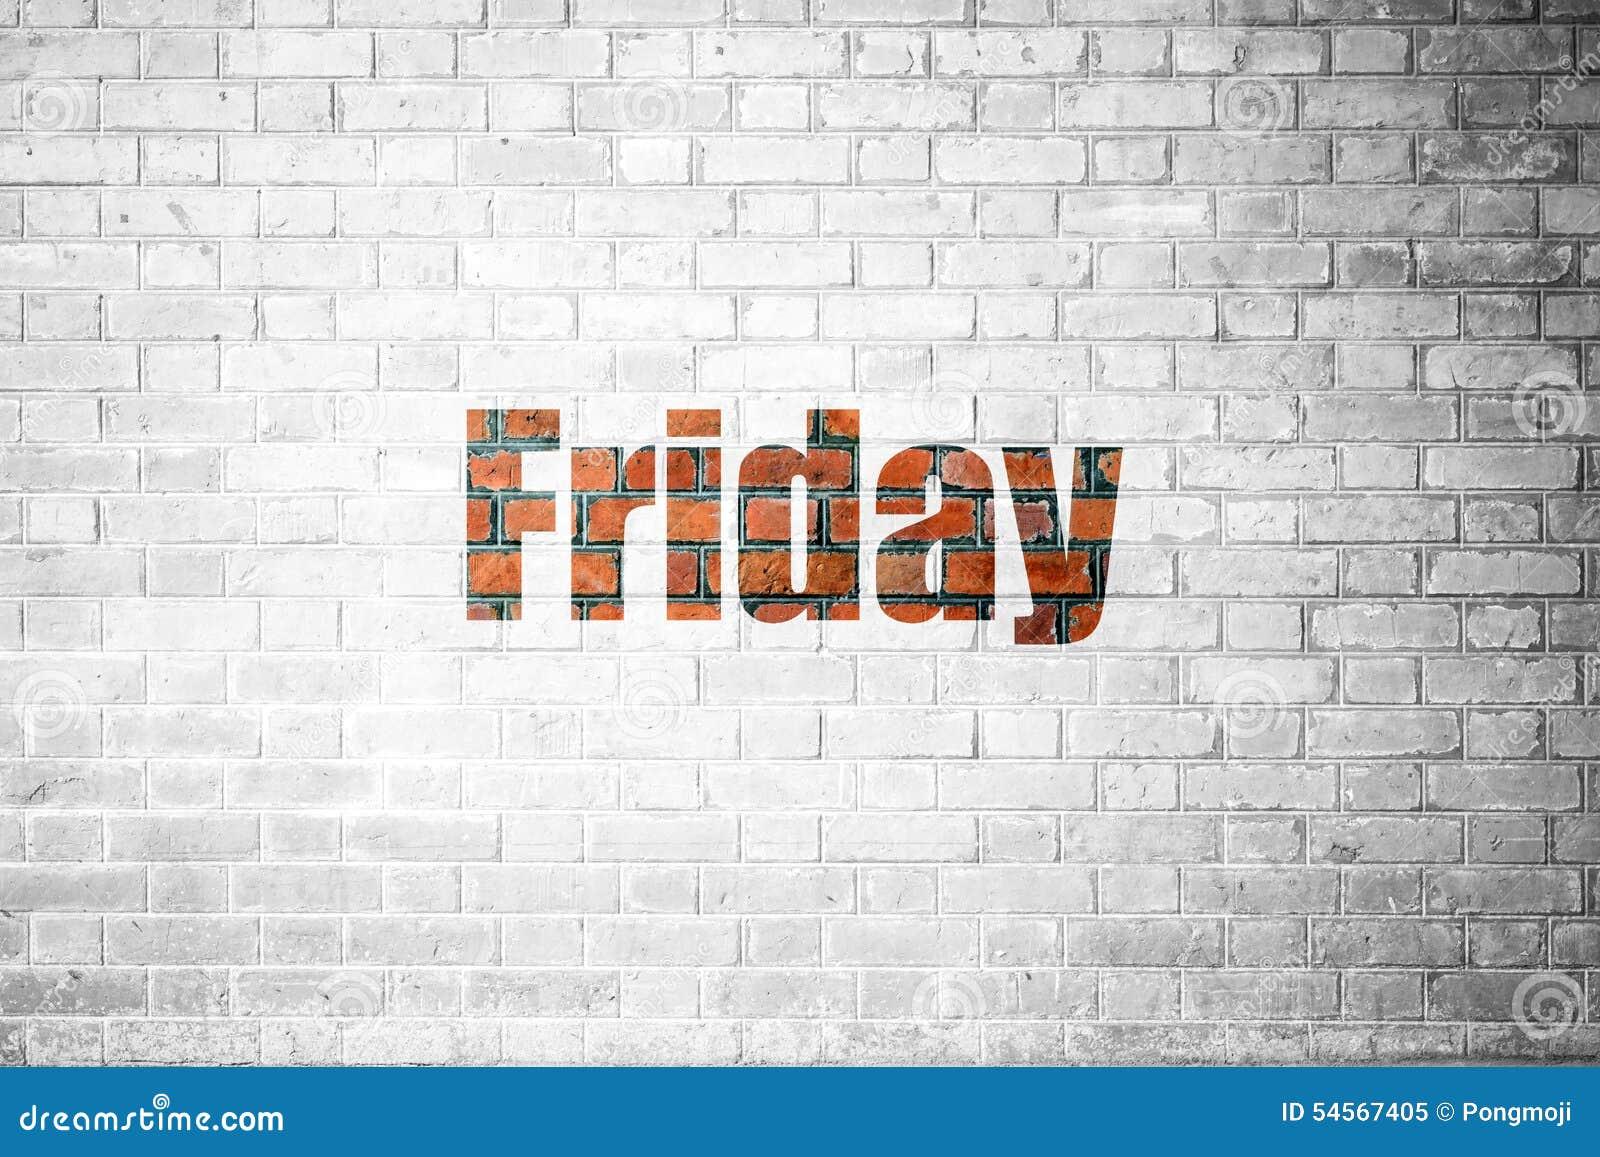 friday day wall calendar reminder weekend plan word